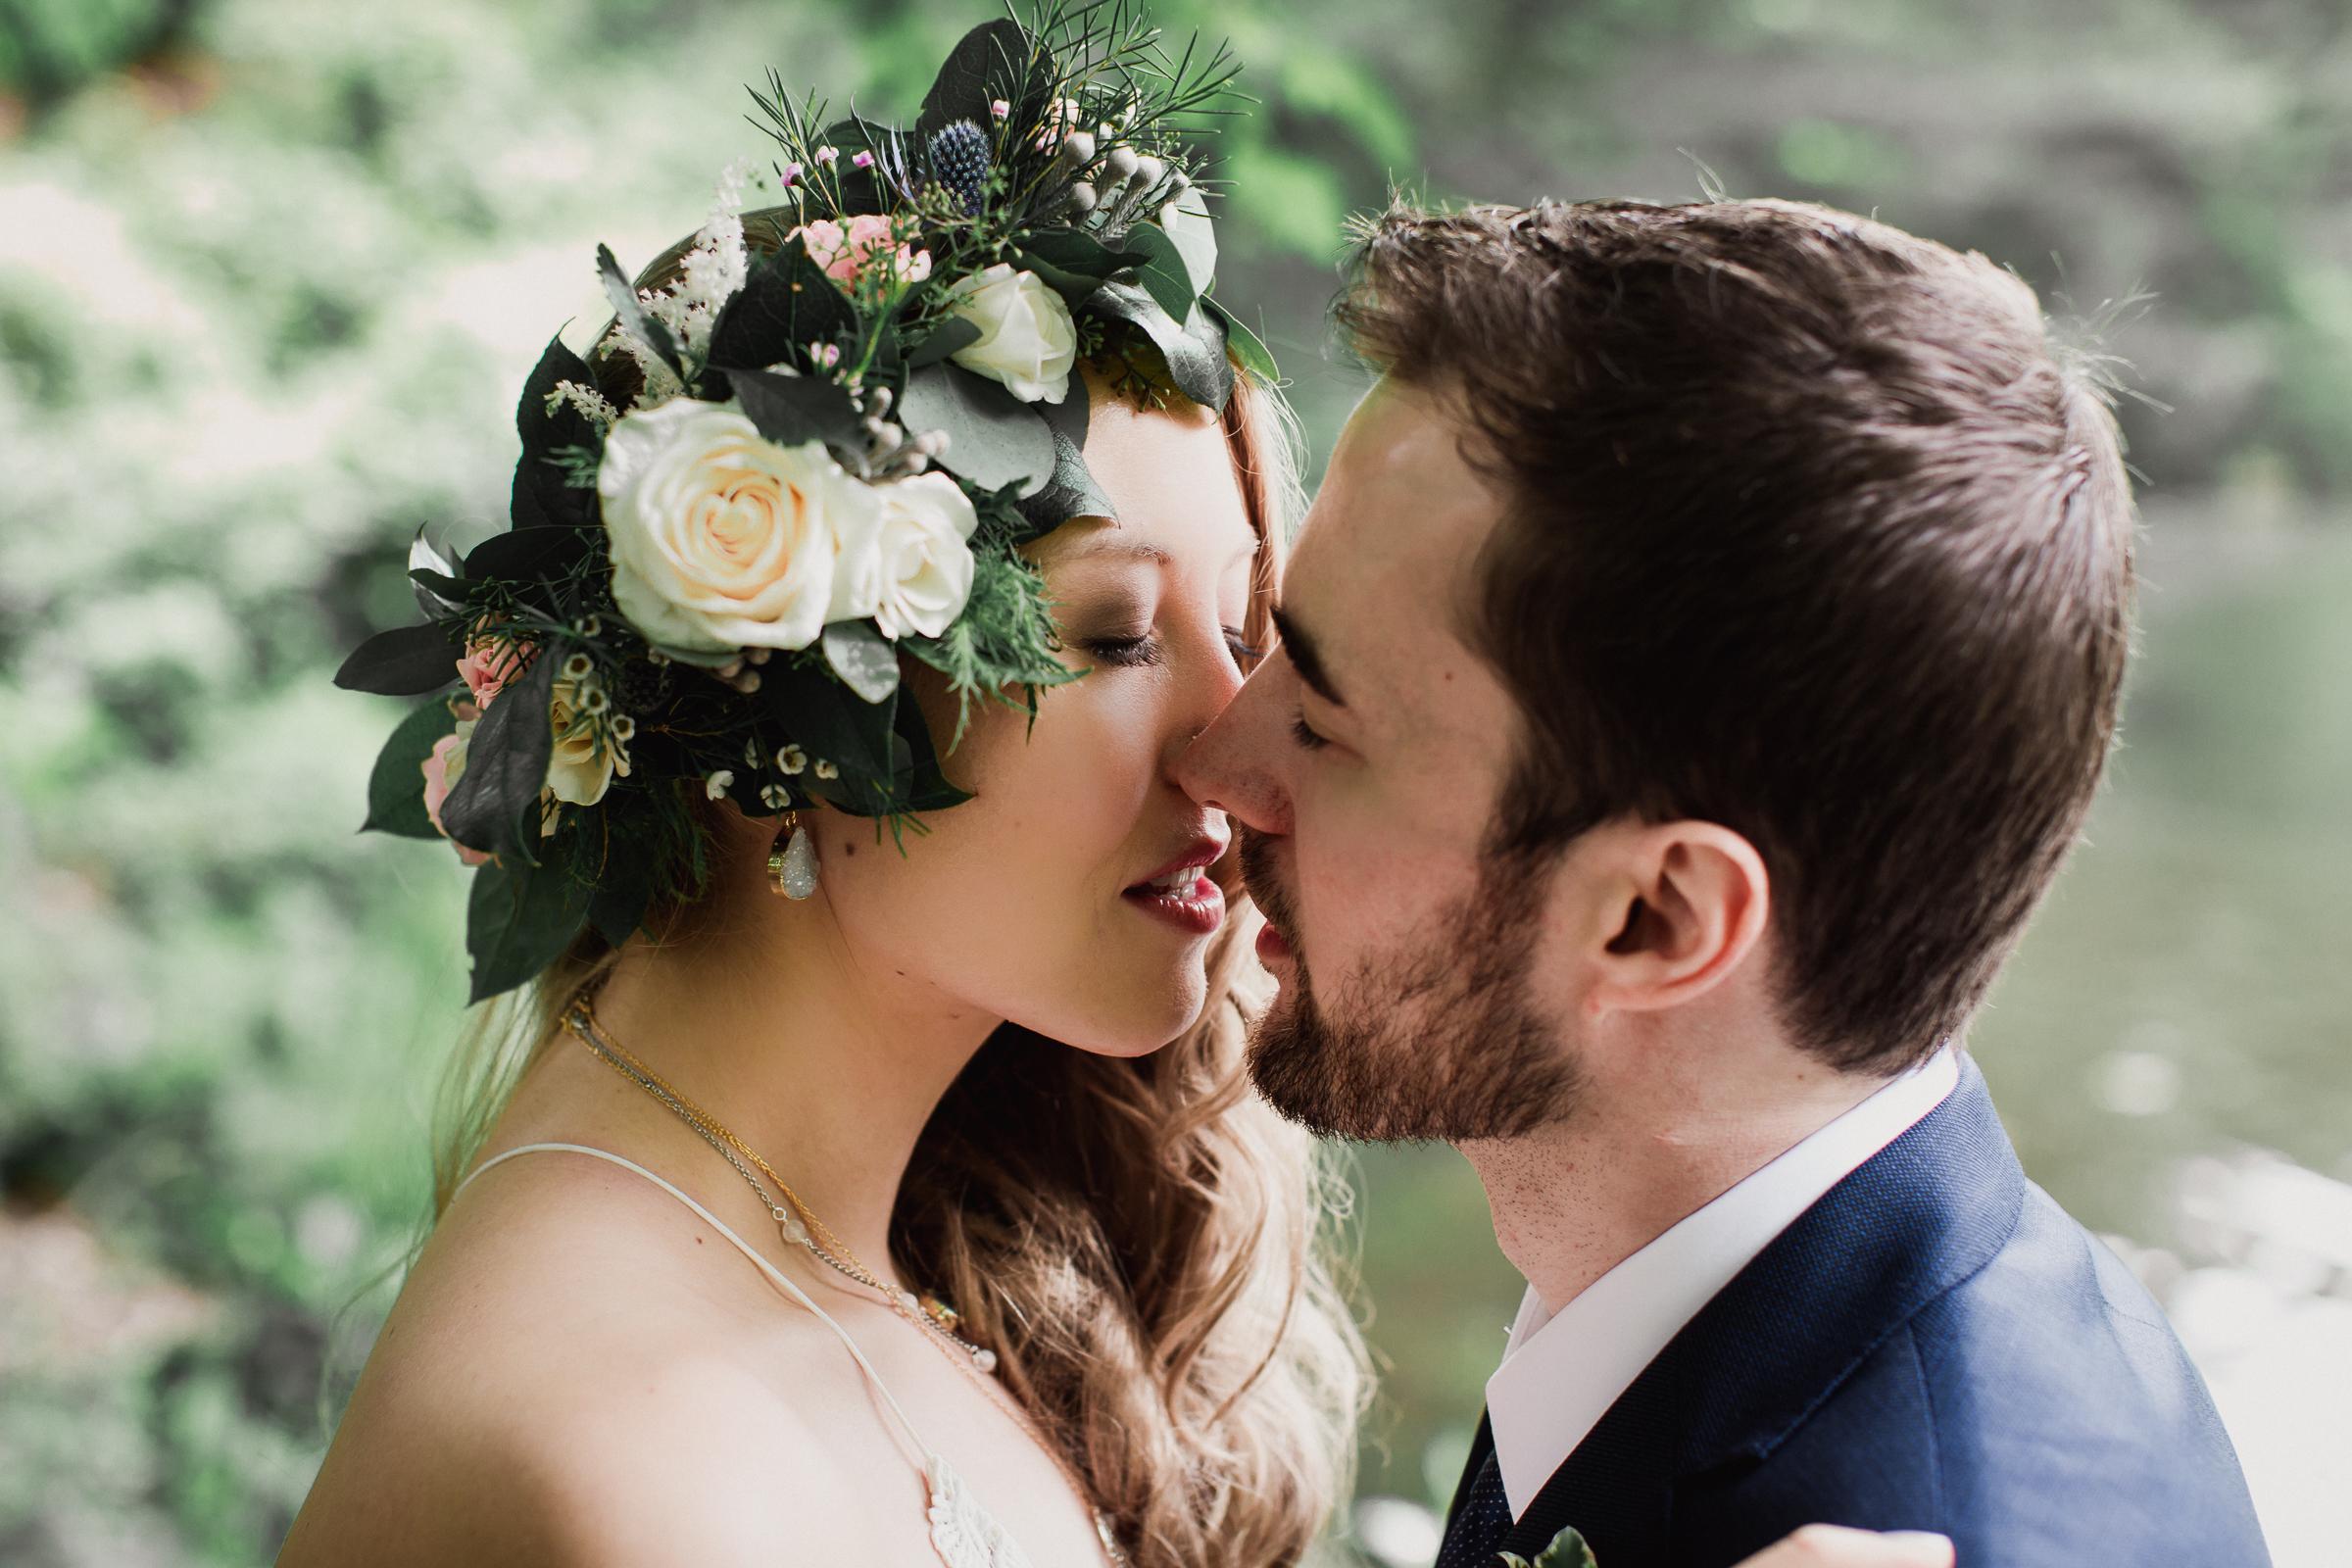 New-York-Documentary-Wedding-Photography-Best-Of-2017-by-Elvira-Kalviste-Photography-32.jpg